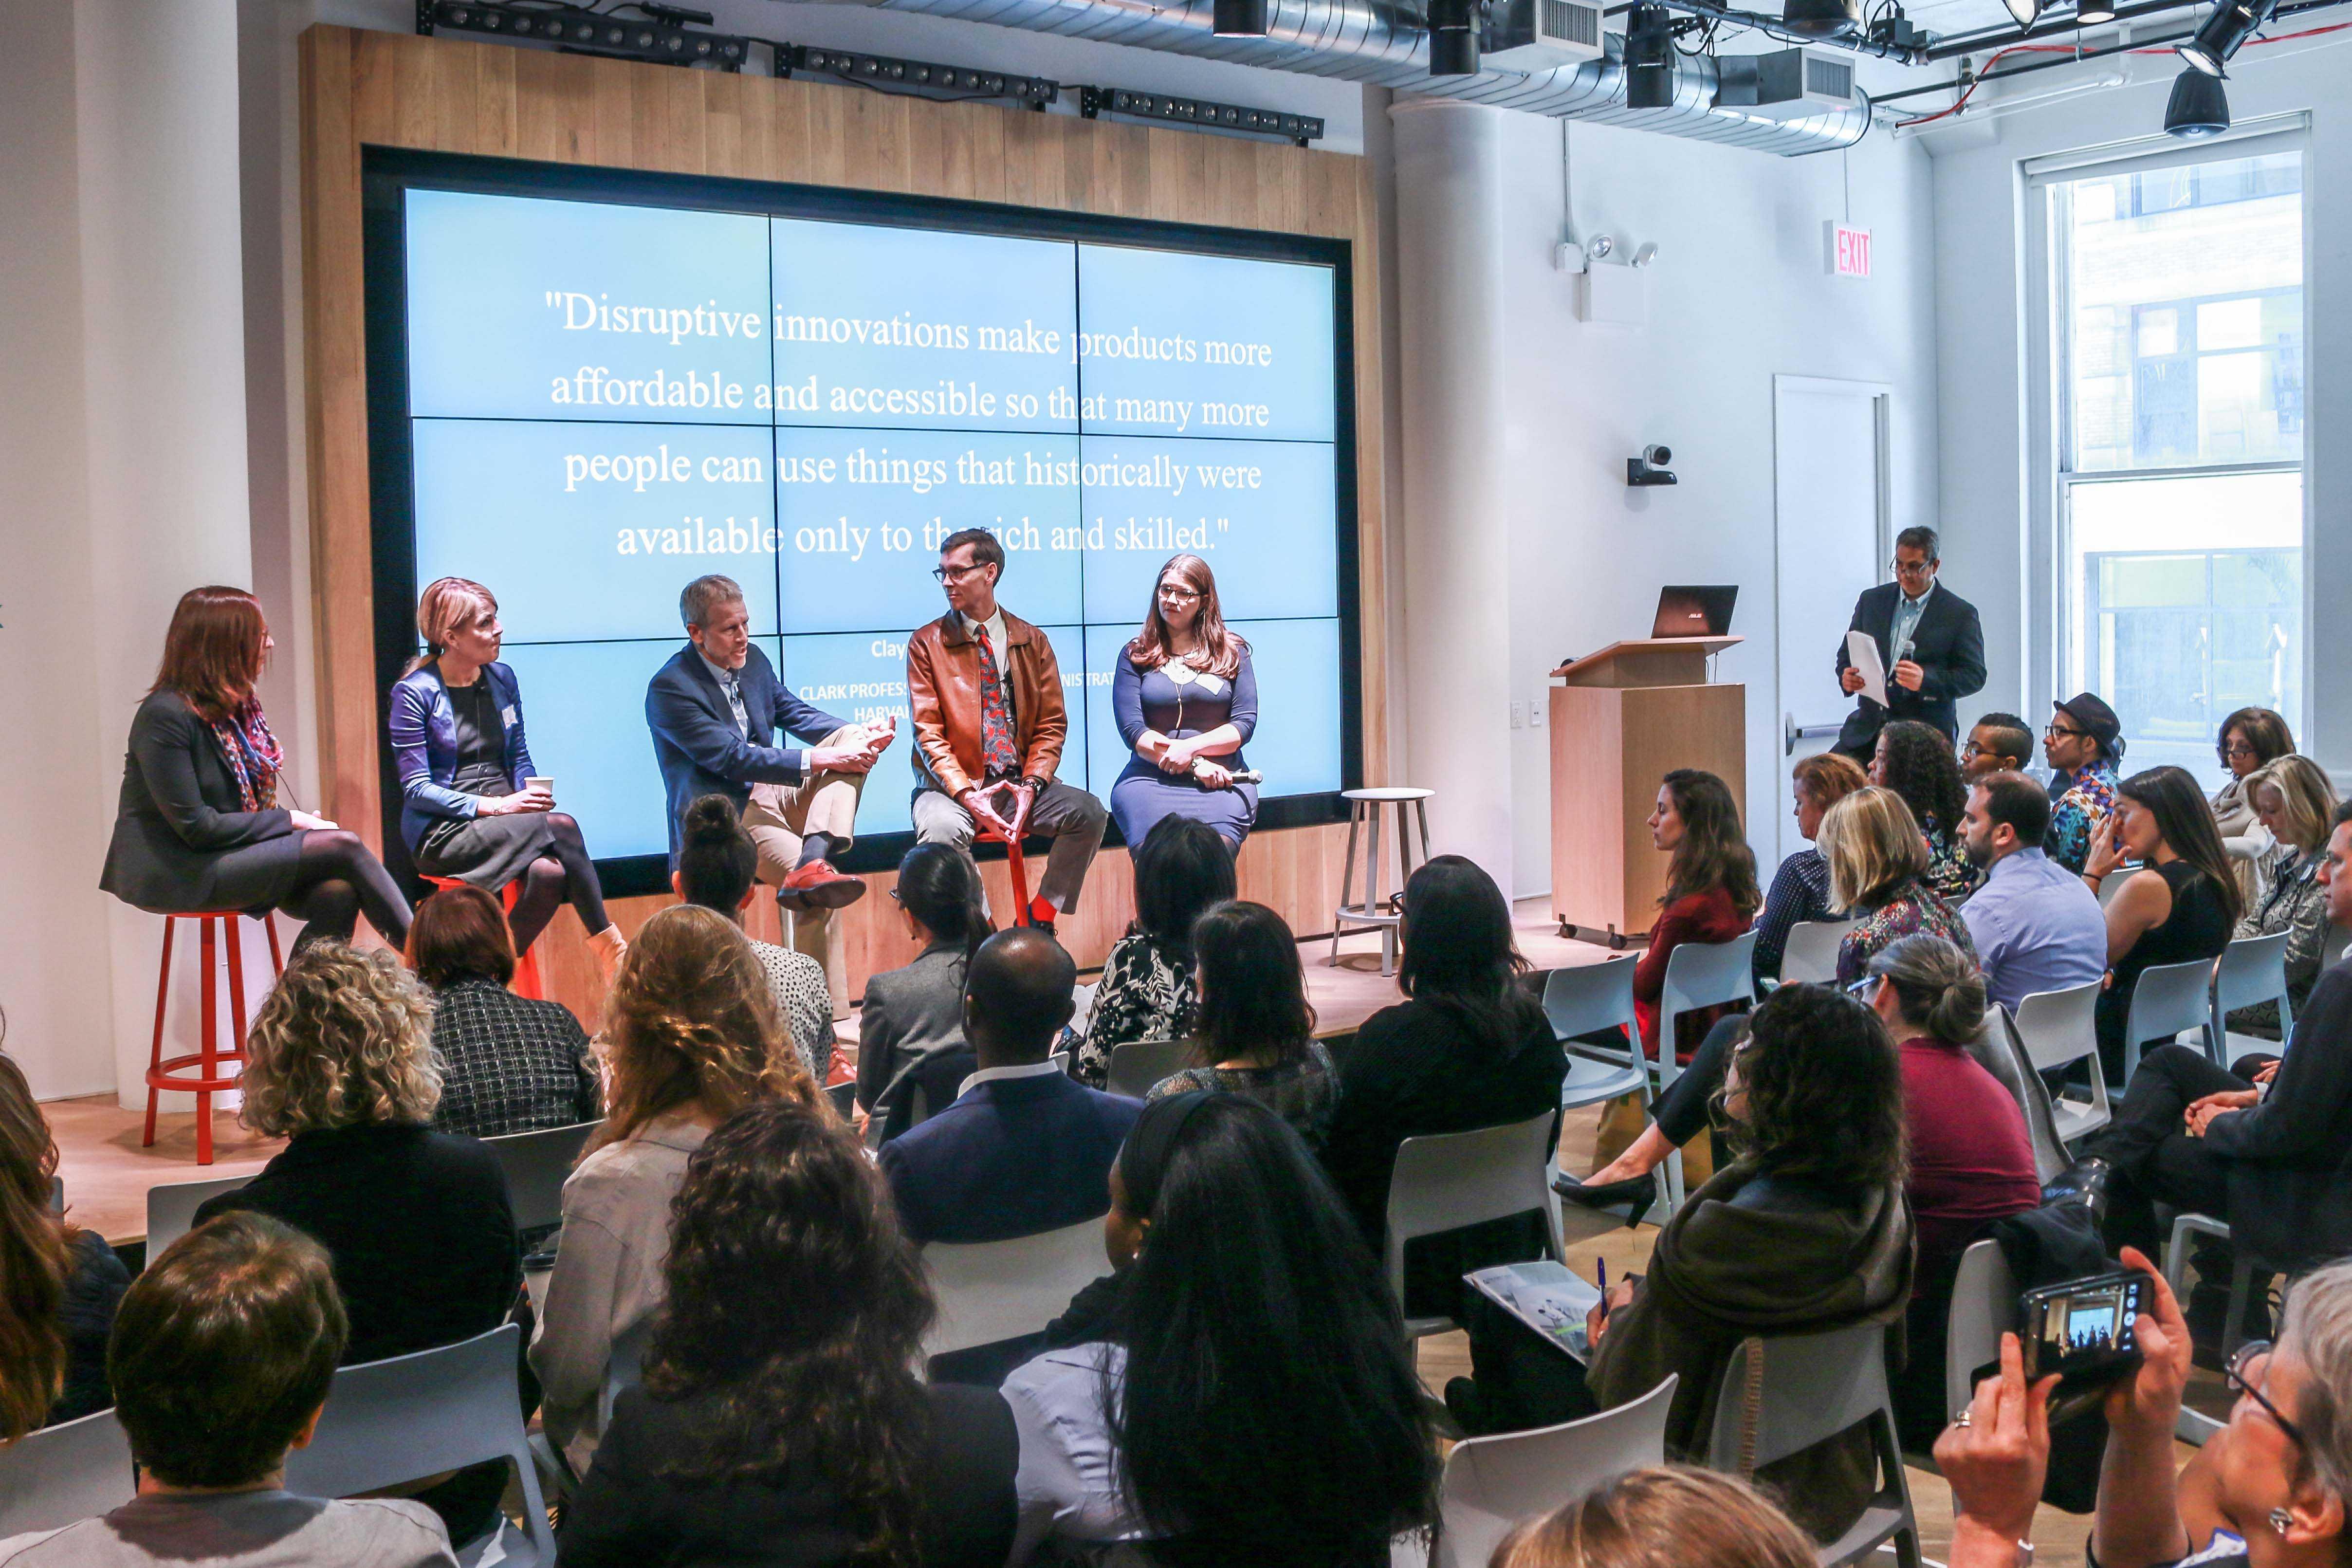 Deborah Goldfarb, Patsy Doerr, Whitney Tilson, Daniel Rabuzzi and Lauren Locke, speaking at NYU Alum David Dosamantes' panel on Corporate Social Responsibility in an Age of Disruption.